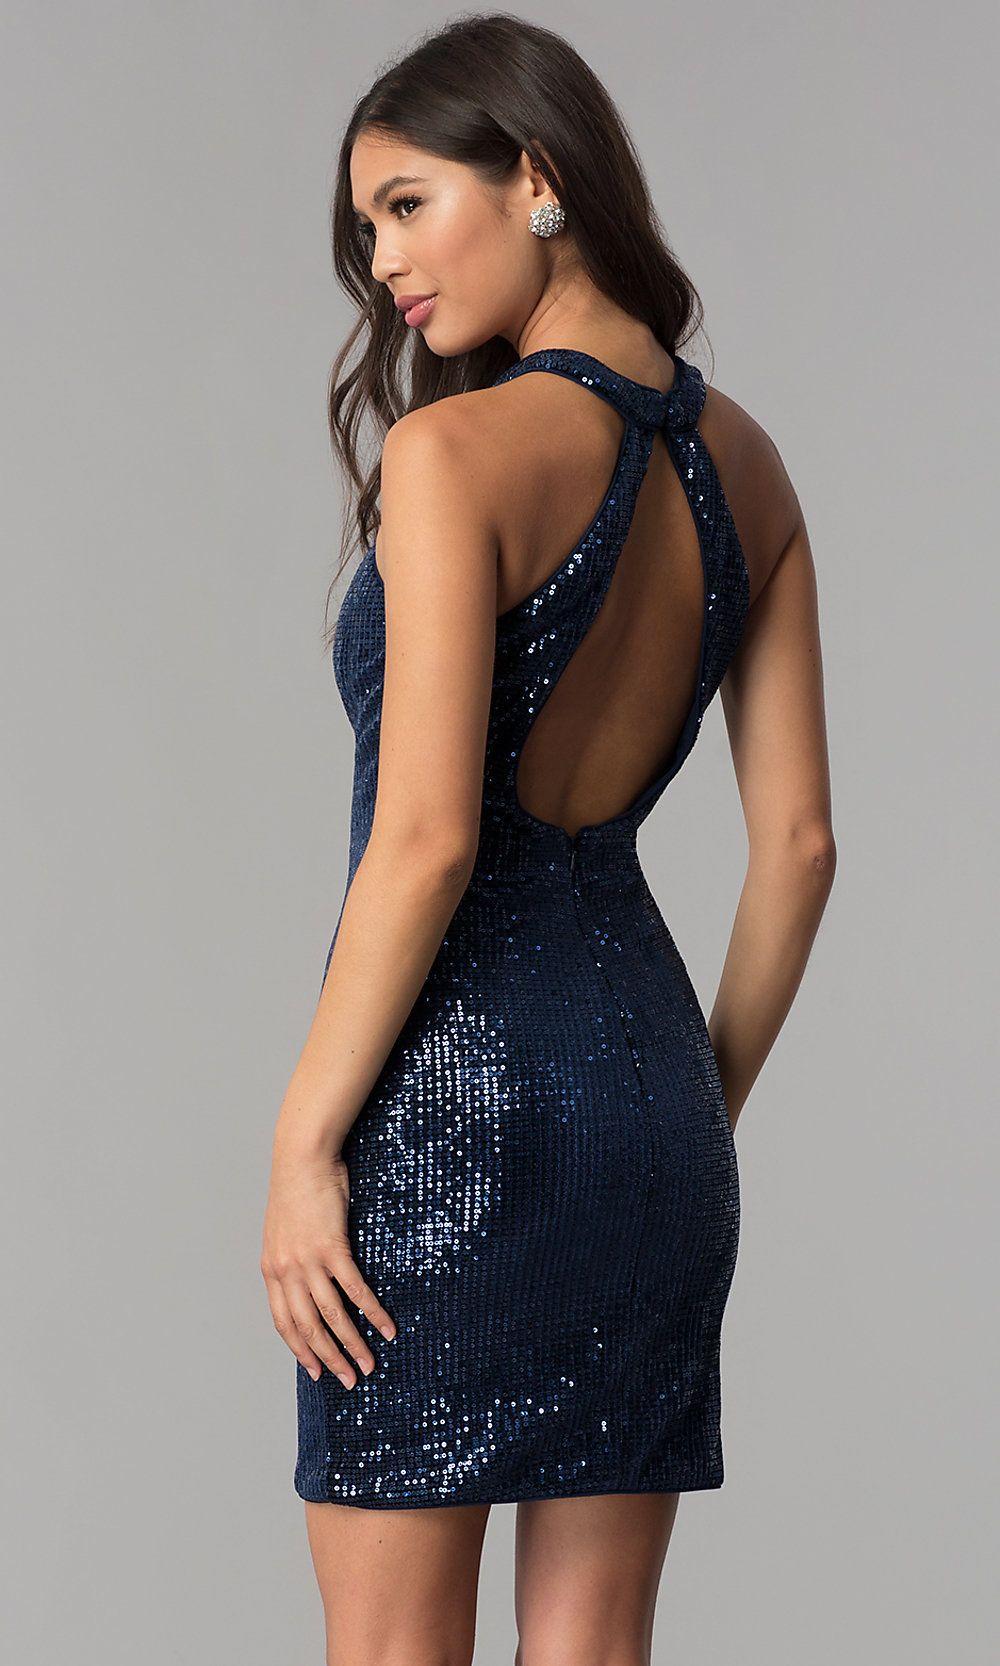 Short Navy Blue High-Neck Sequin Homecoming Dress #navyblueshortdress